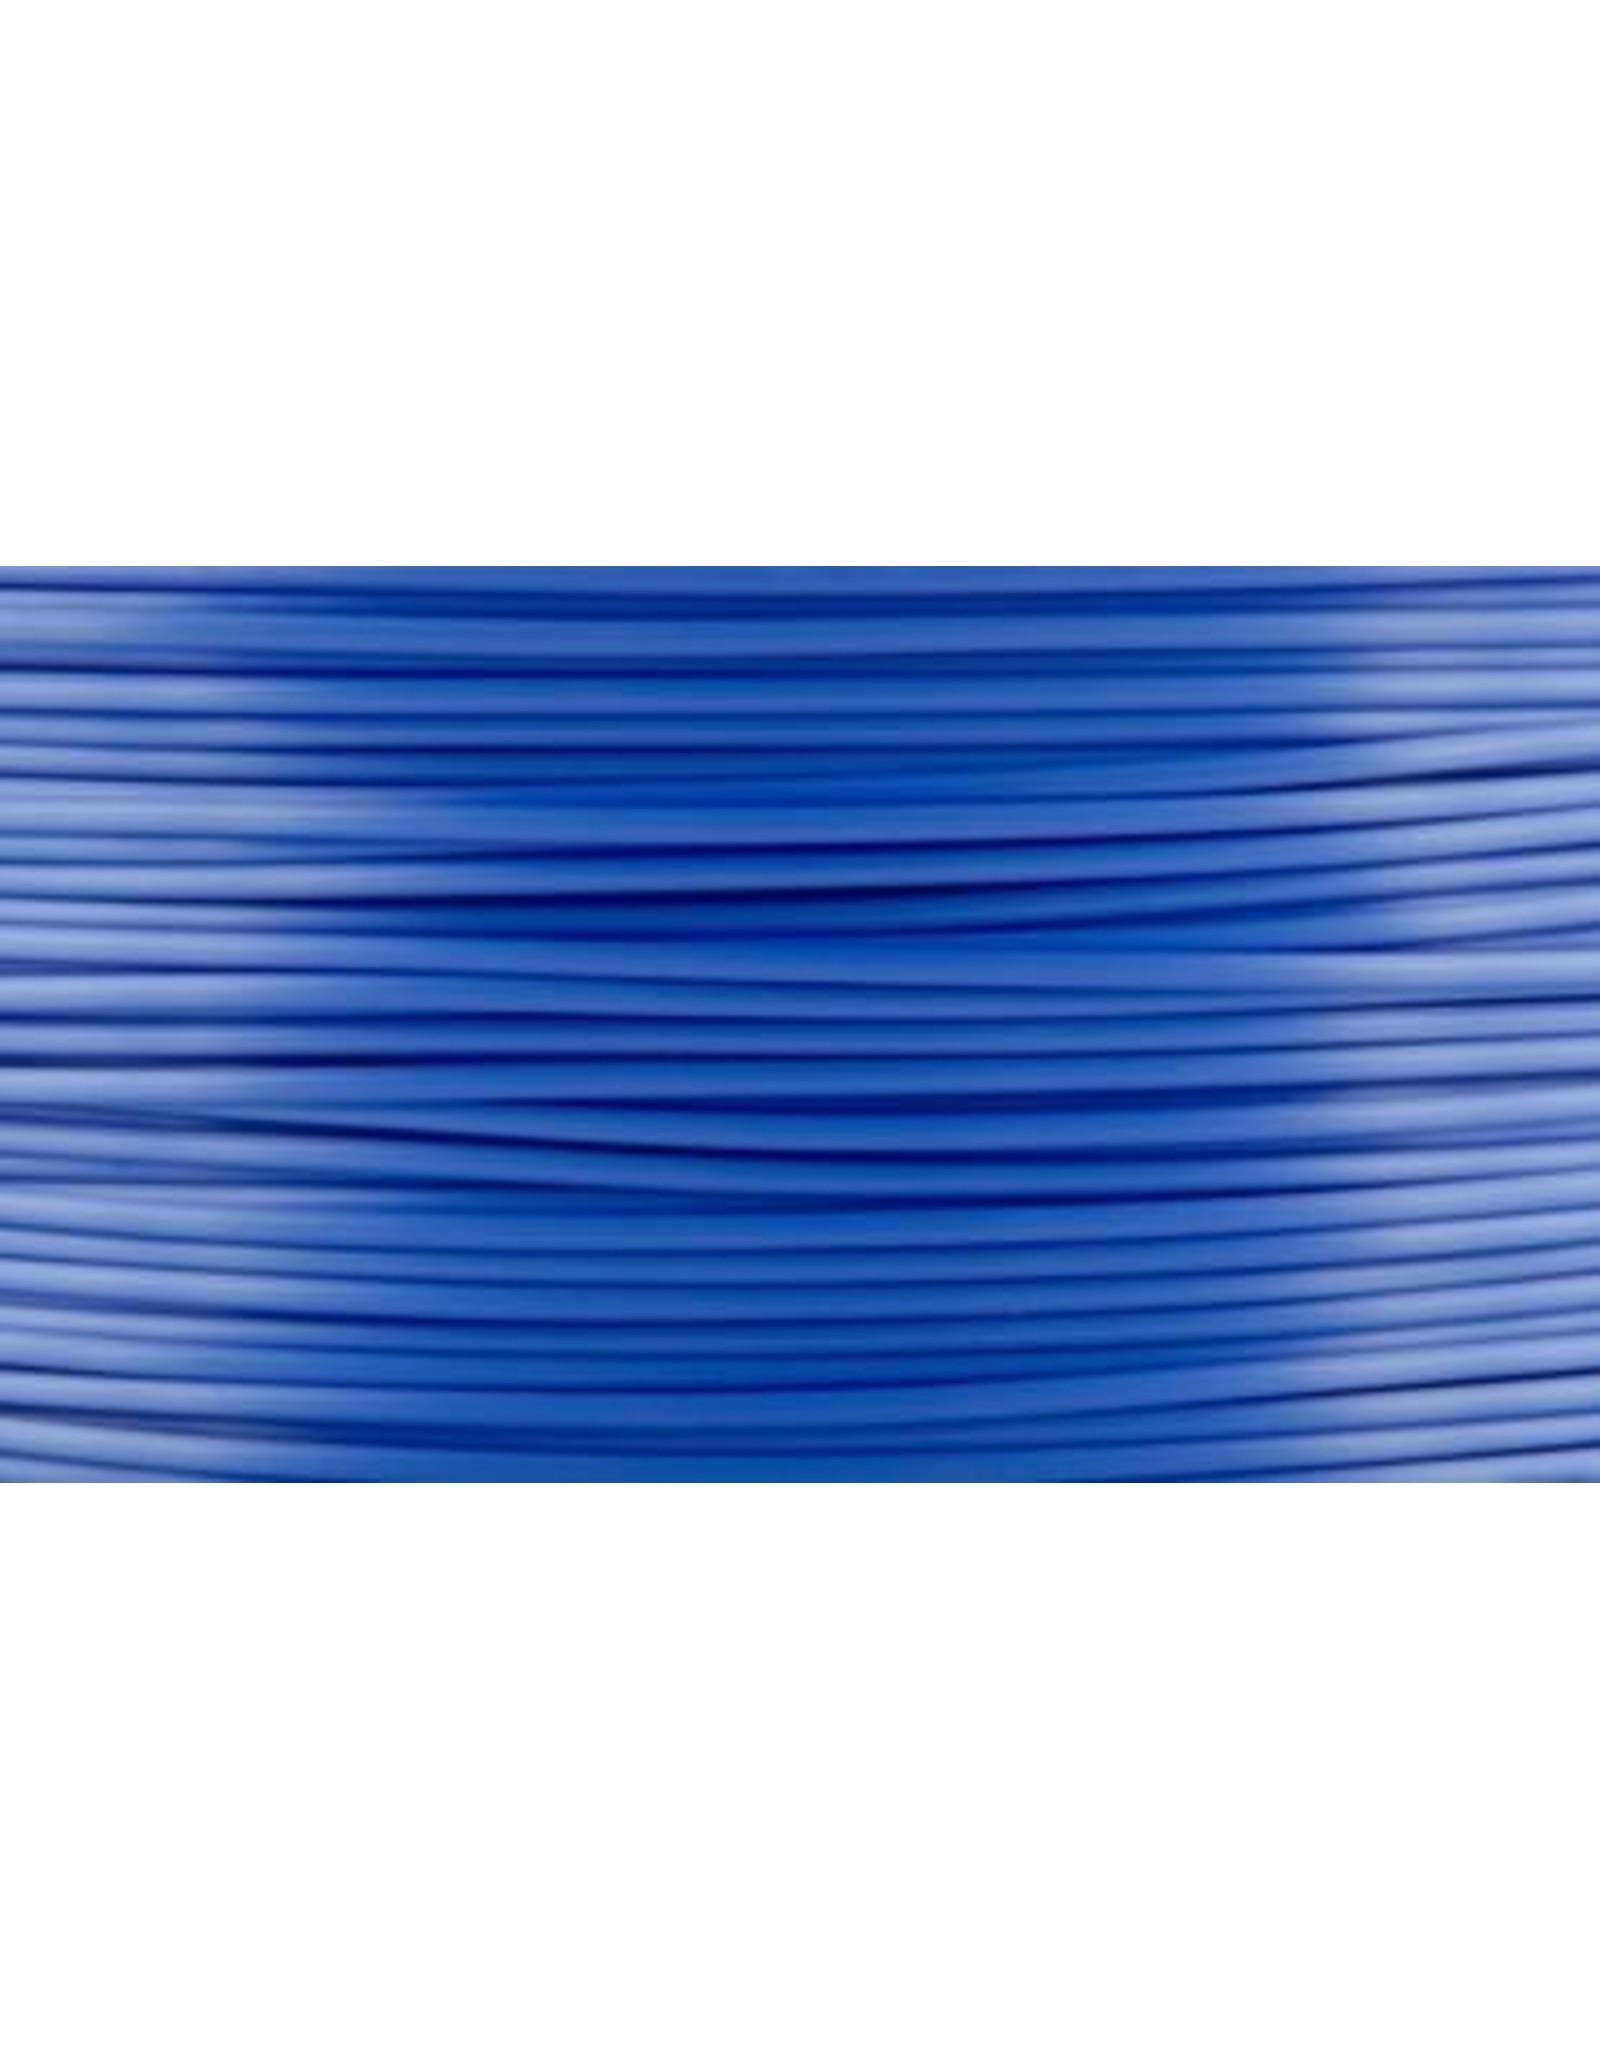 Prima PrimaSelect PLA Satin 1.75mm - 750gr Blue